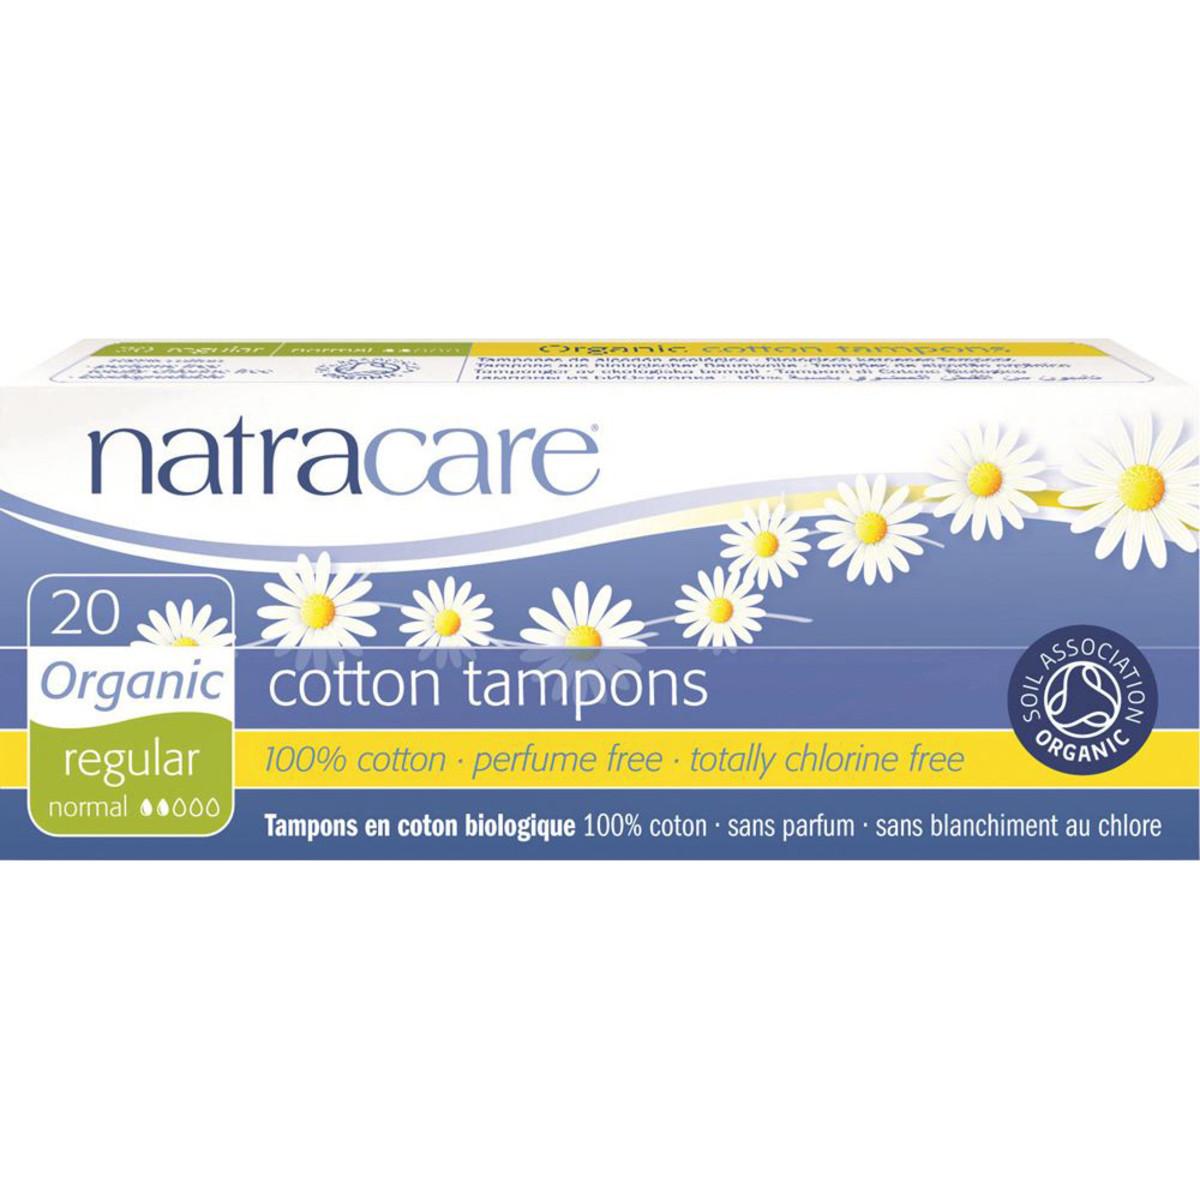 NATRACARE COTTON TAMPONS REGULAR ORGANIC 20 PACK